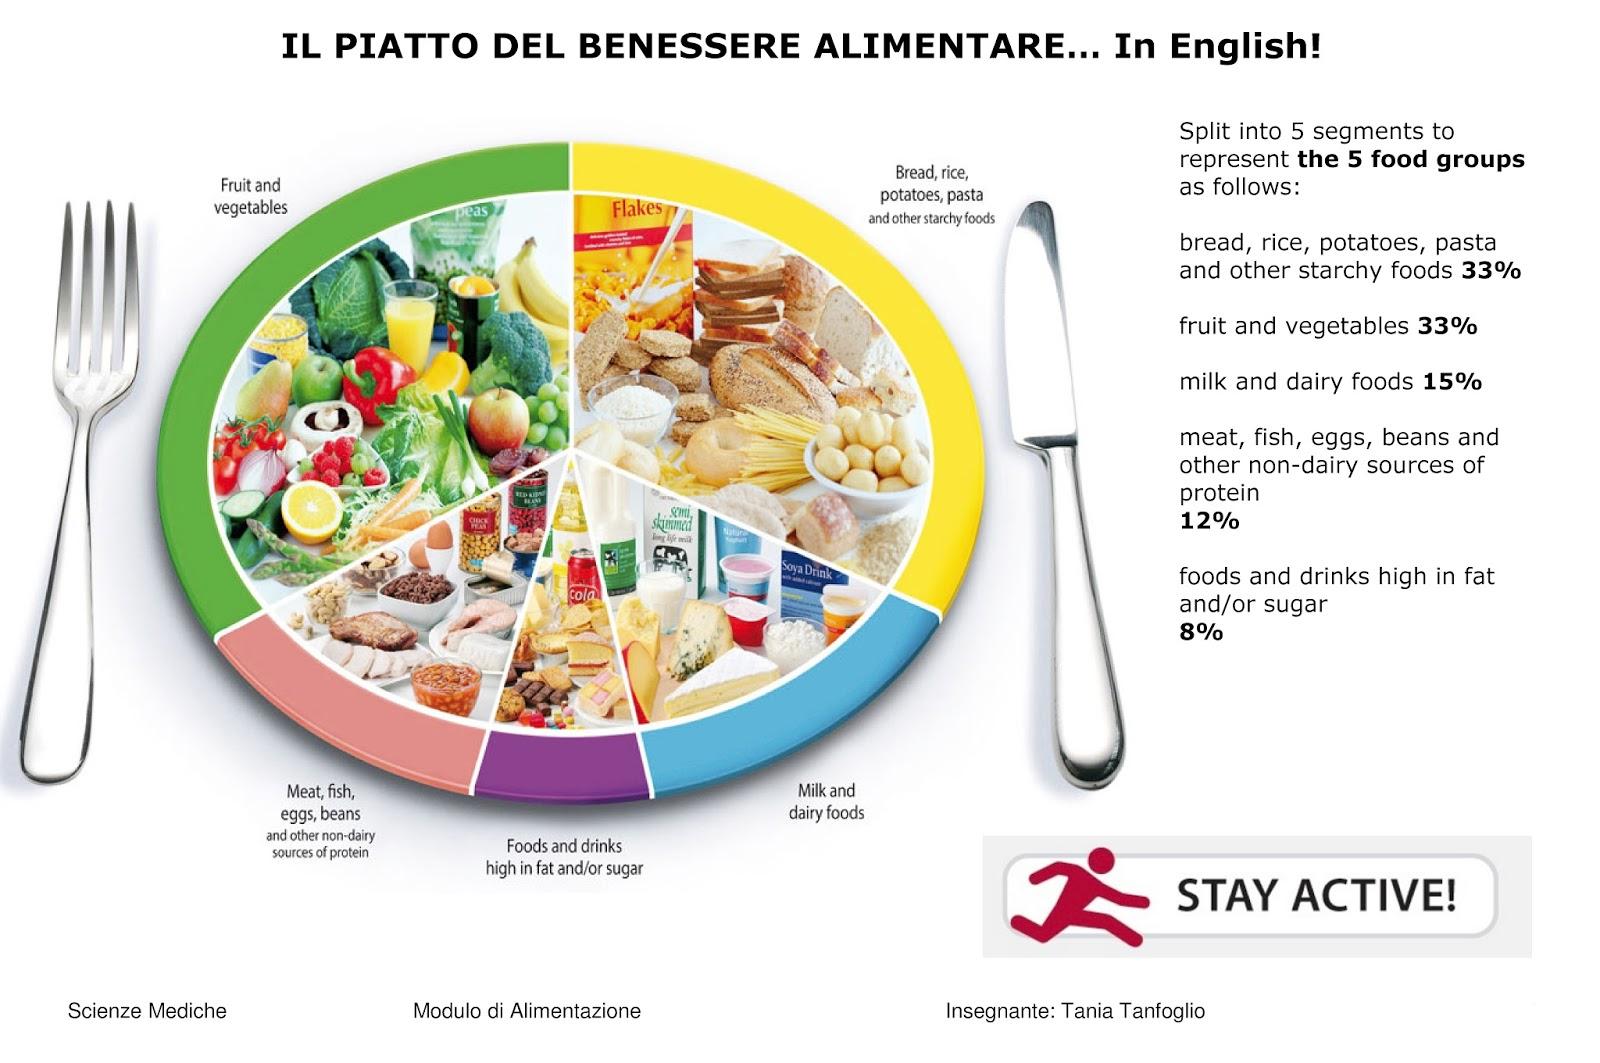 importanza di una dieta sana in inglese